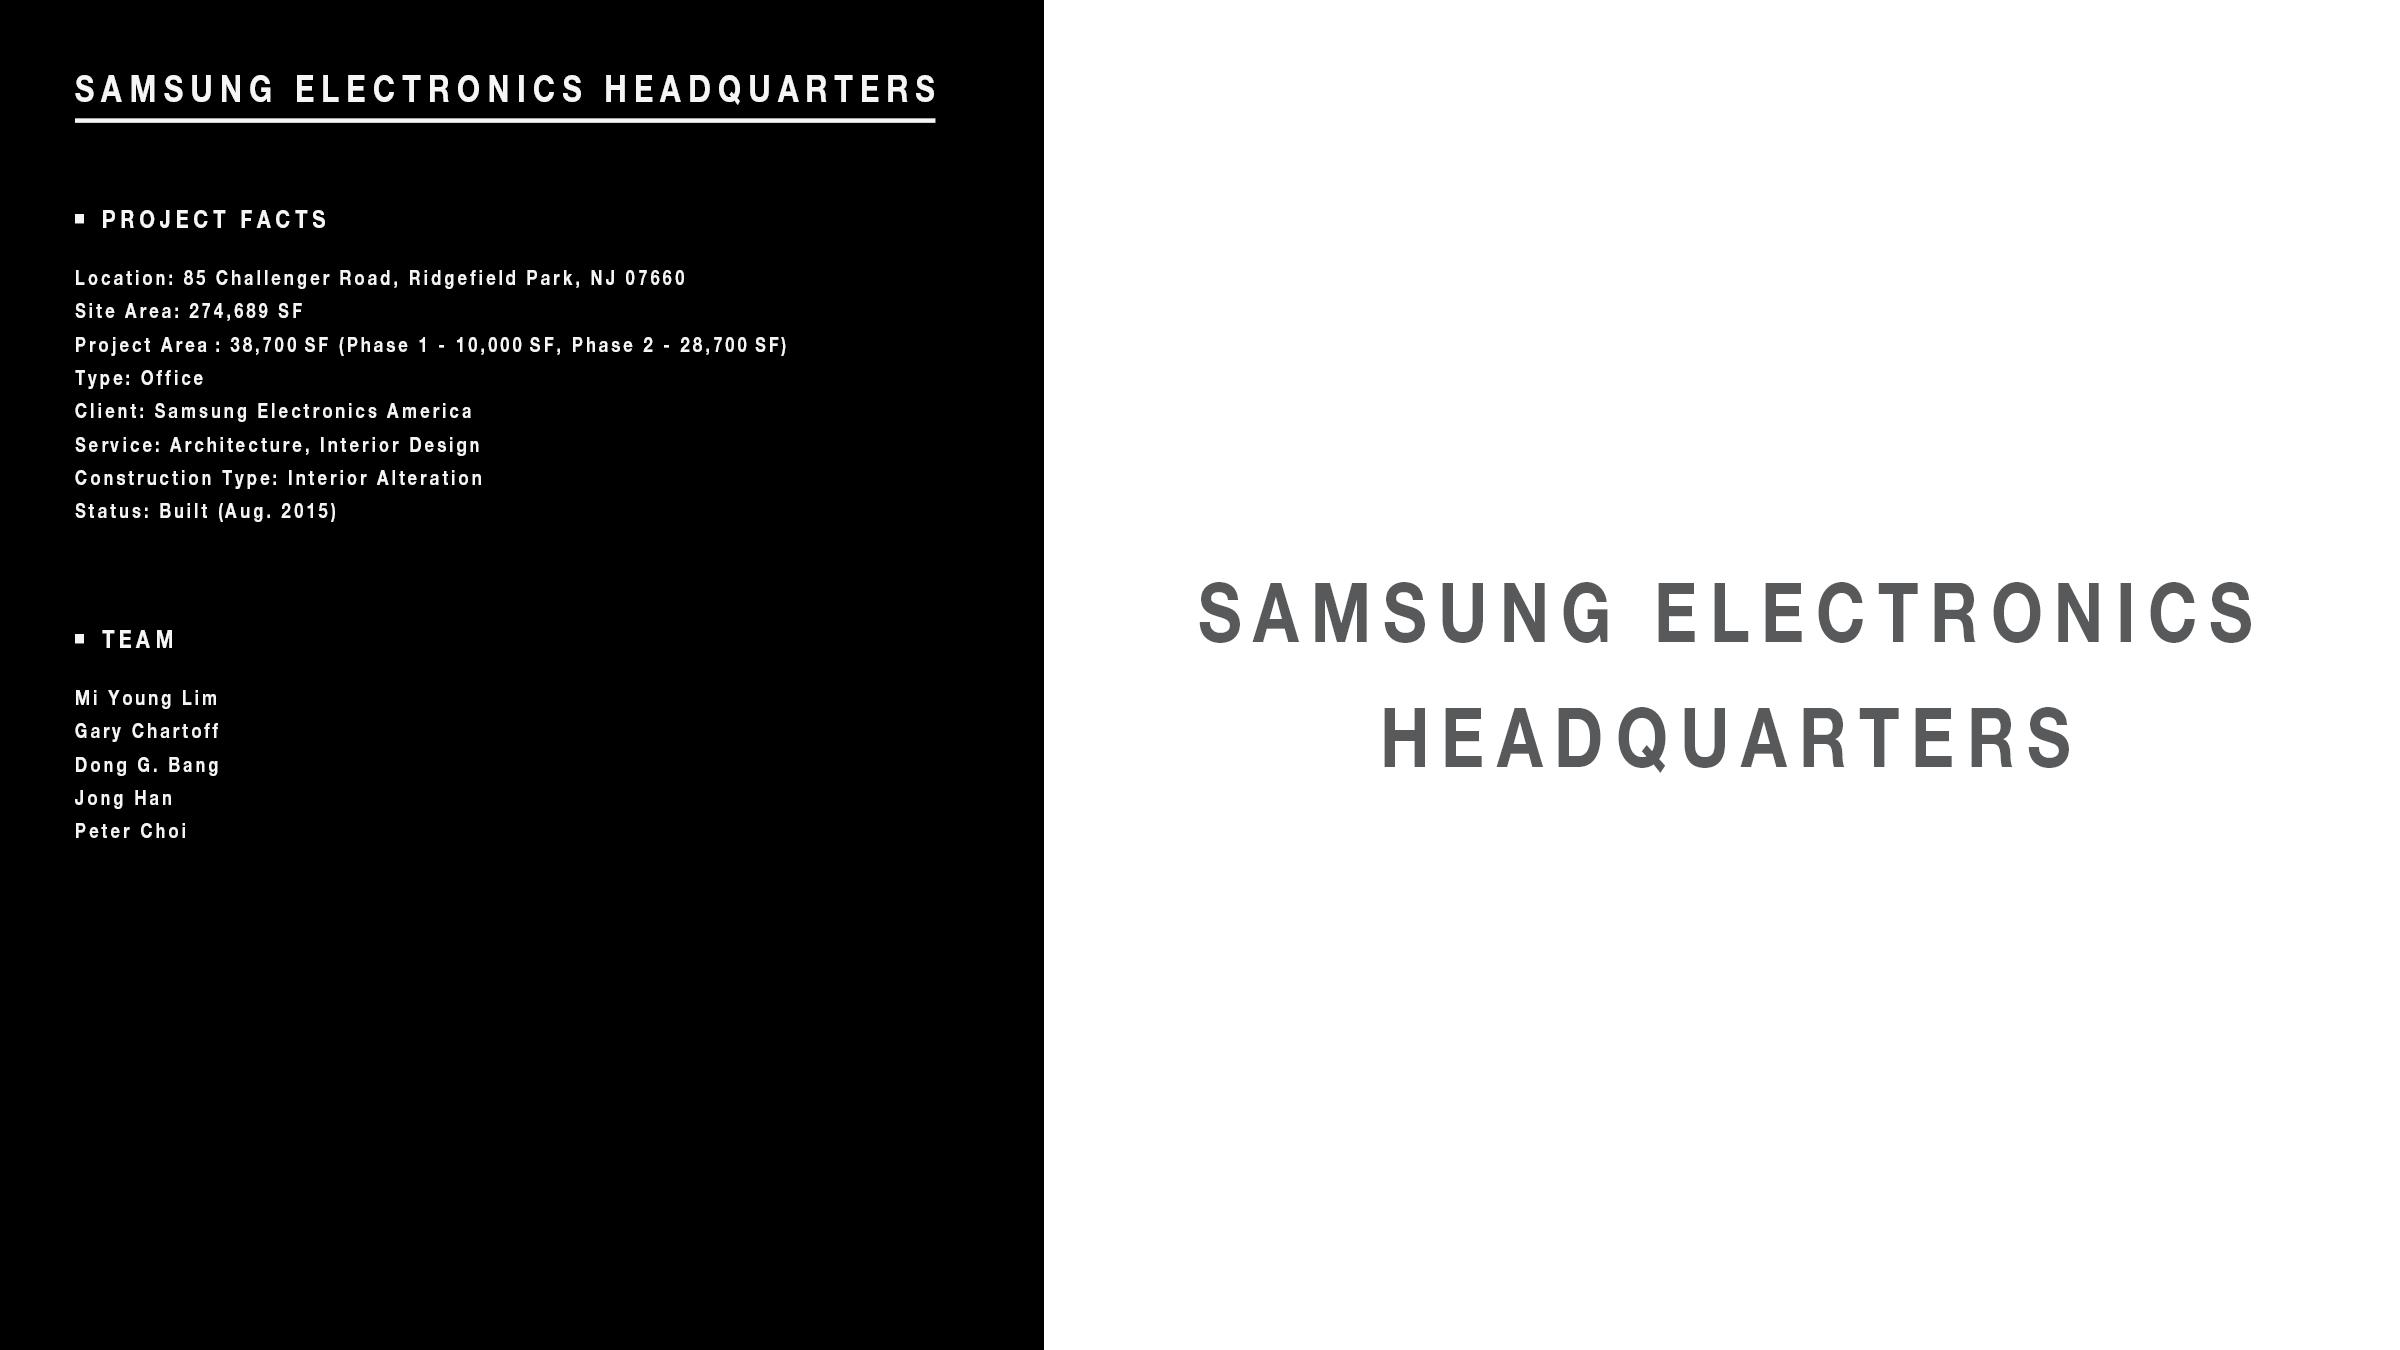 Pioli_Samsung Electronics Headquarters.png